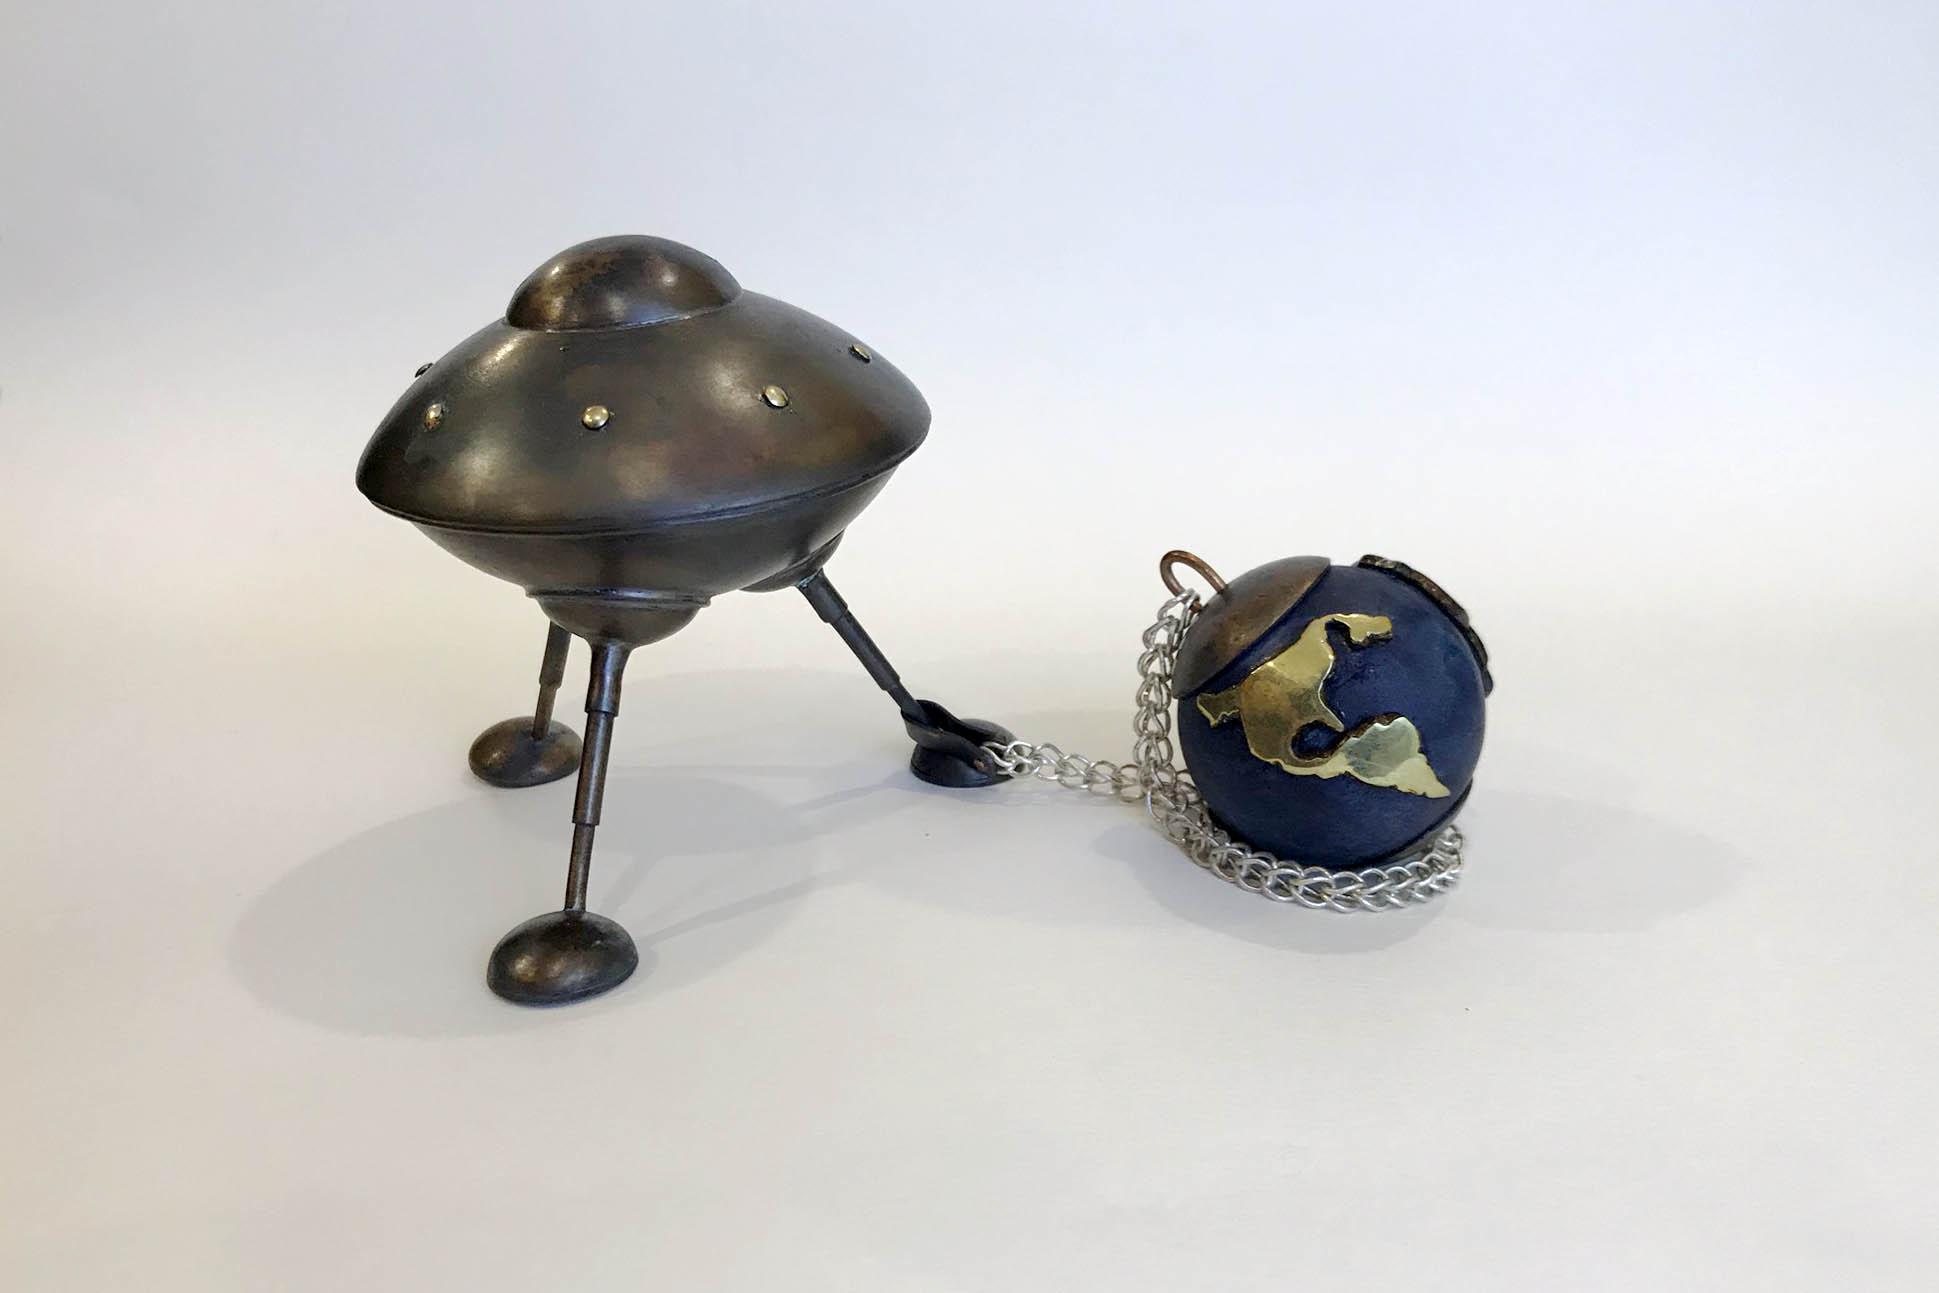 Metalsmithing Series - Metalsmithing Rockets, UFOs, and Constellation Pieces